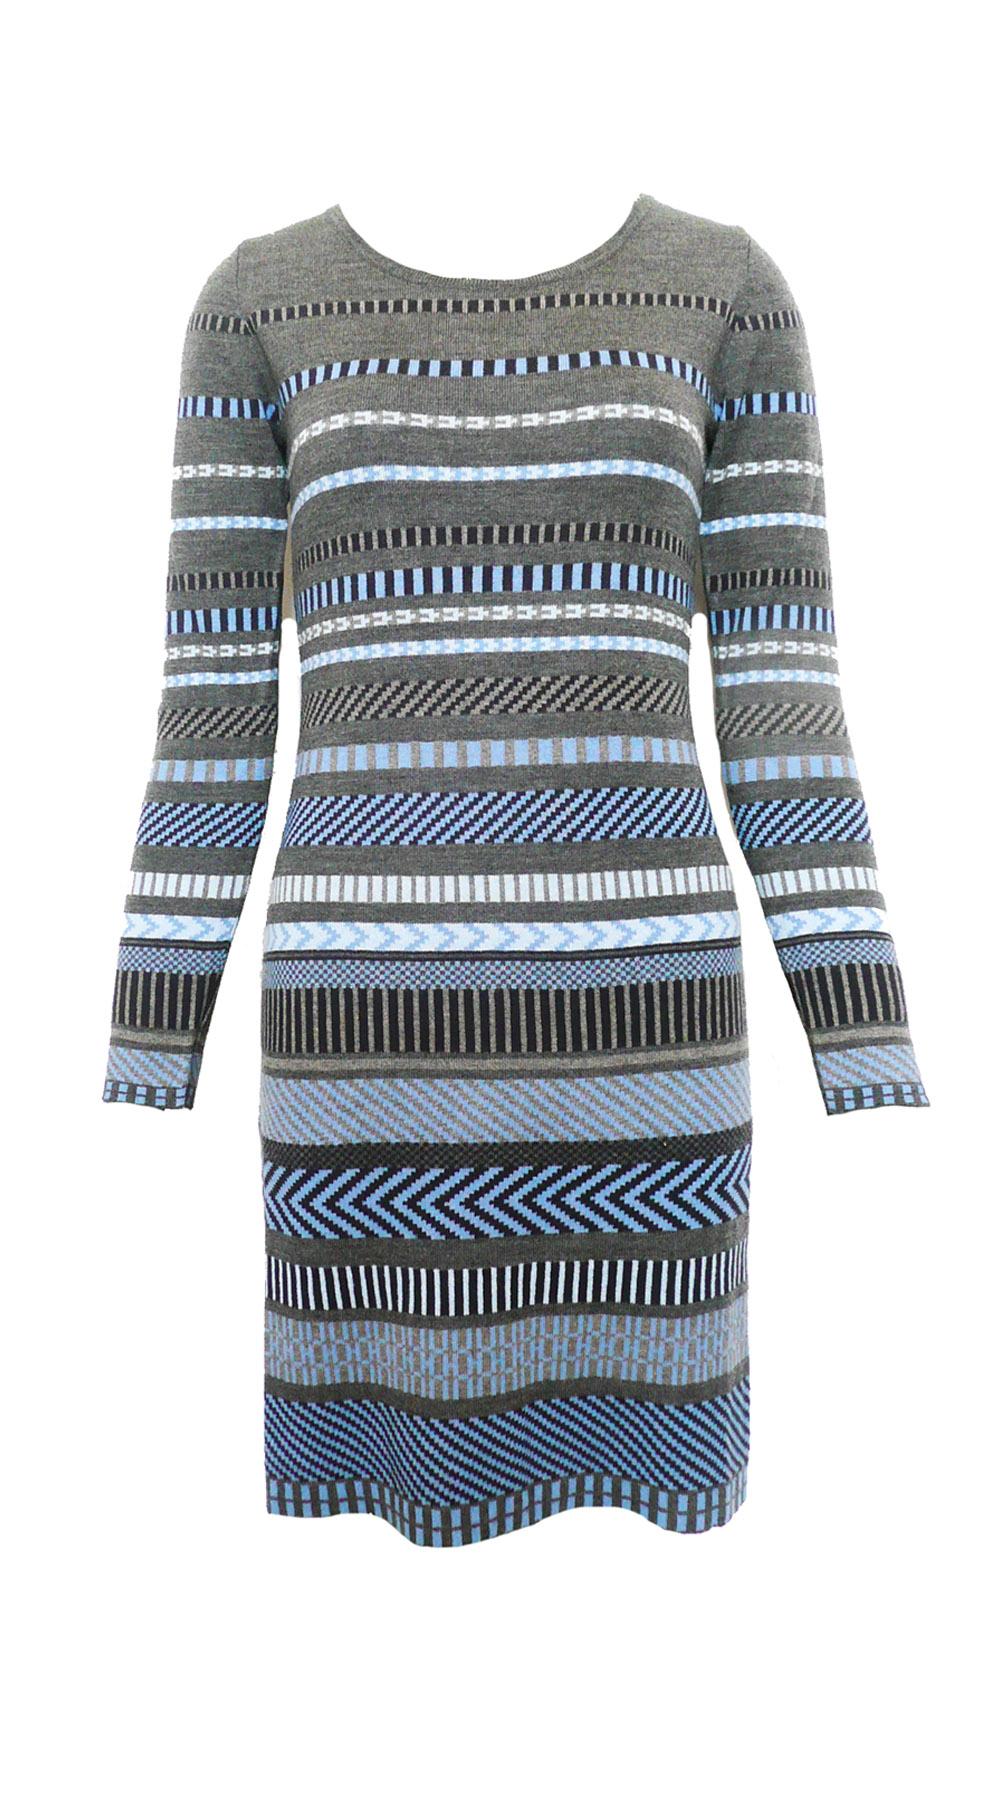 dress grey blu stripe knt.jpg